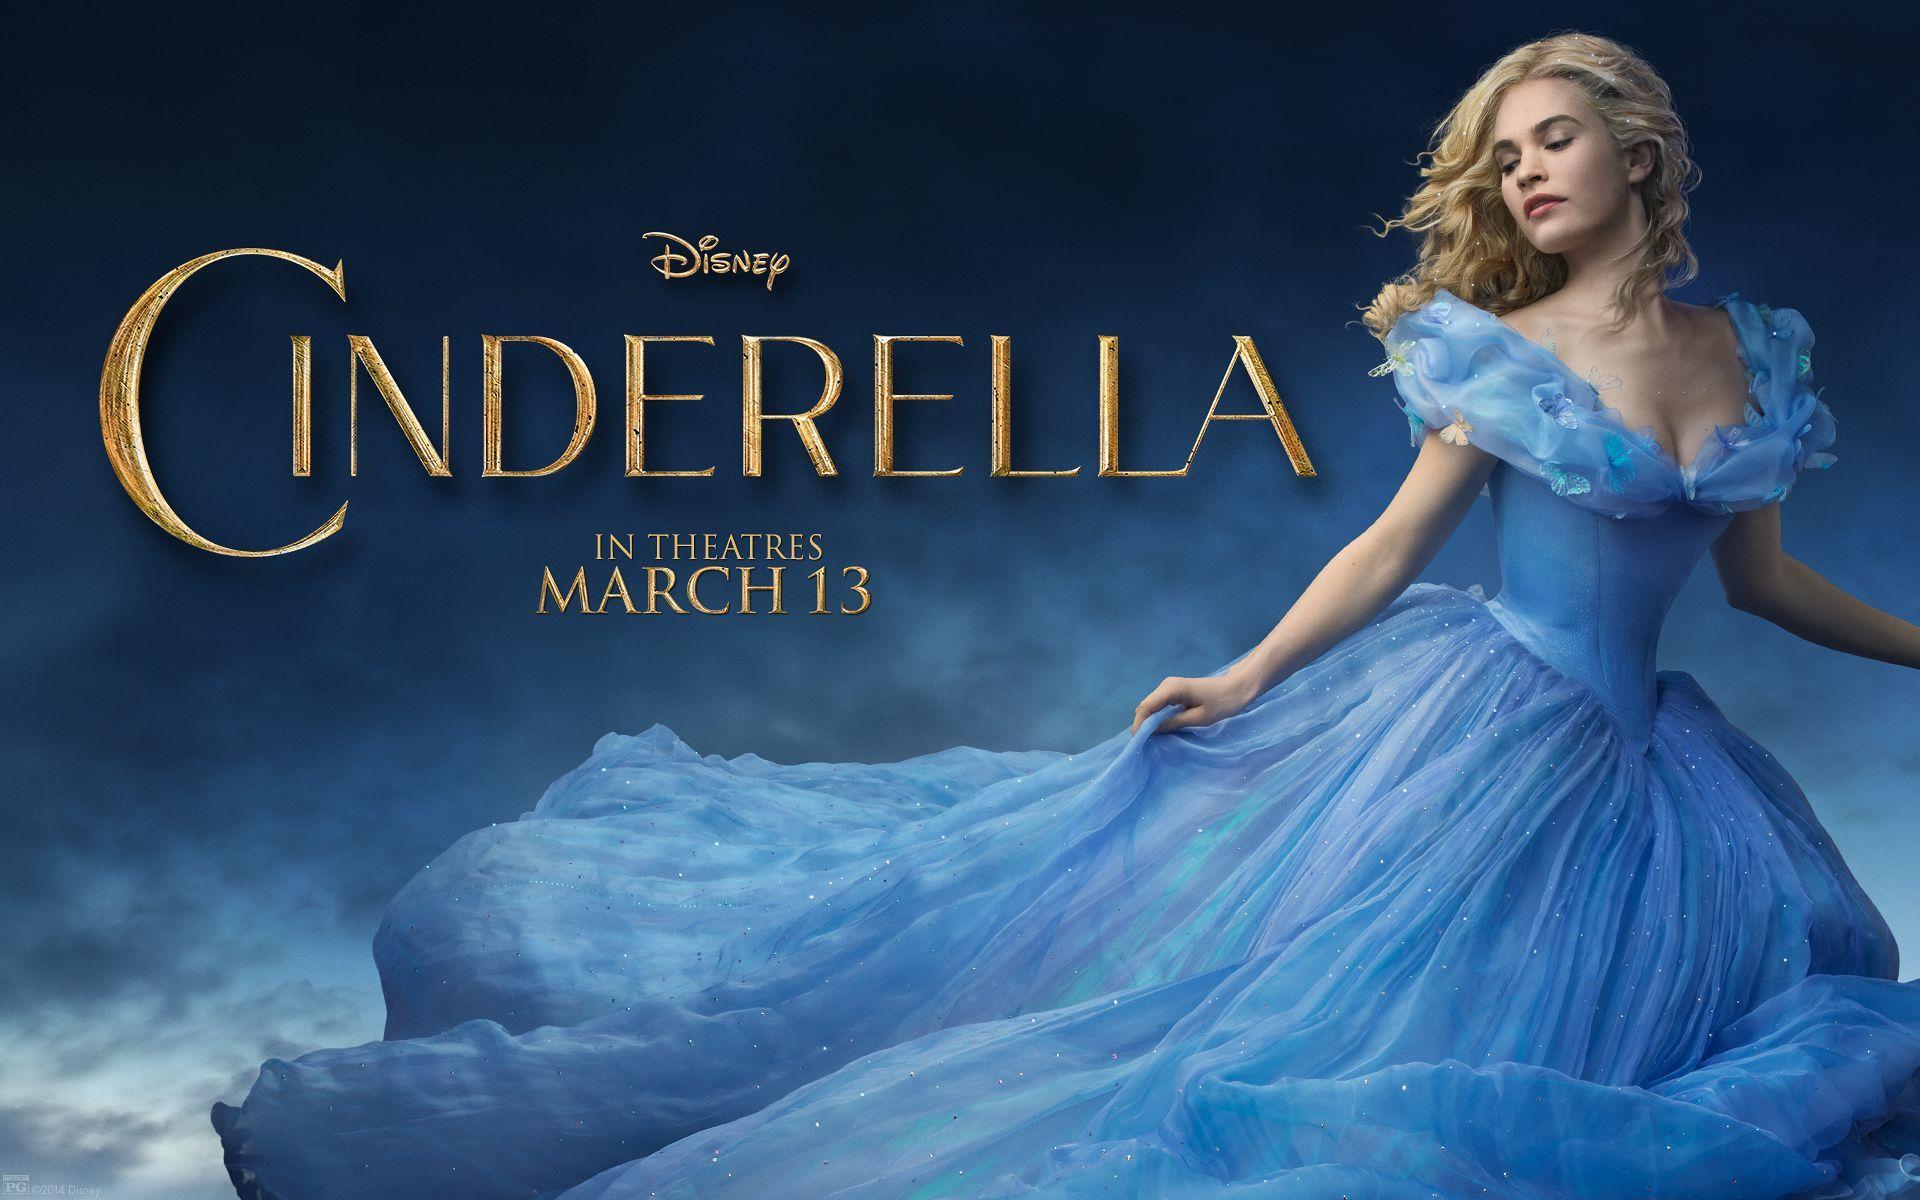 Disney Lily James As The Enchanted Princess Cinderella Cinderella Movie Cinderella Disney Cinderella